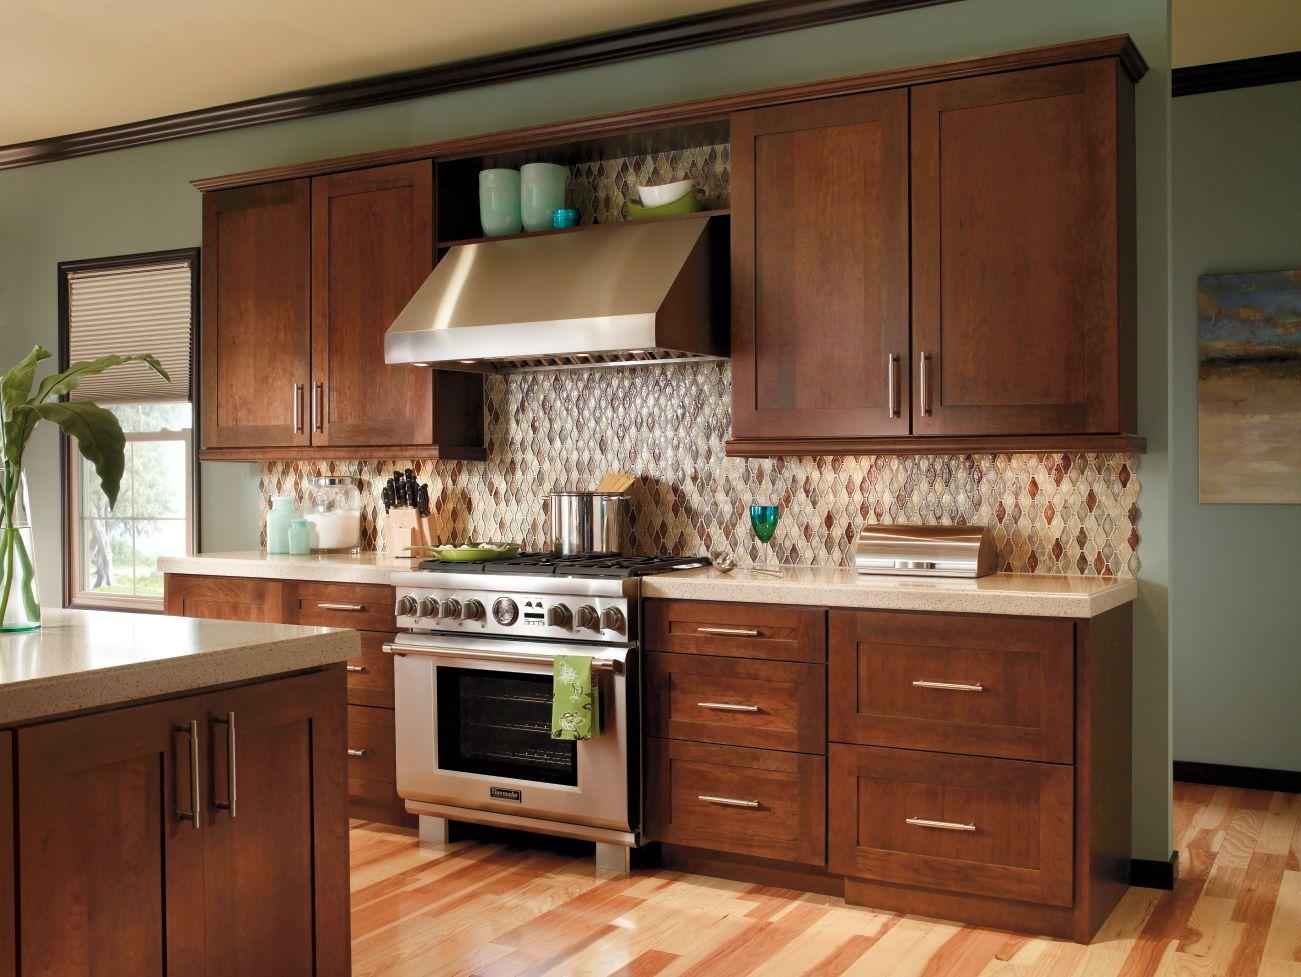 Modern Kitchen Cabinets Cherry transitional modern kitchen cabinets that can read shaker or